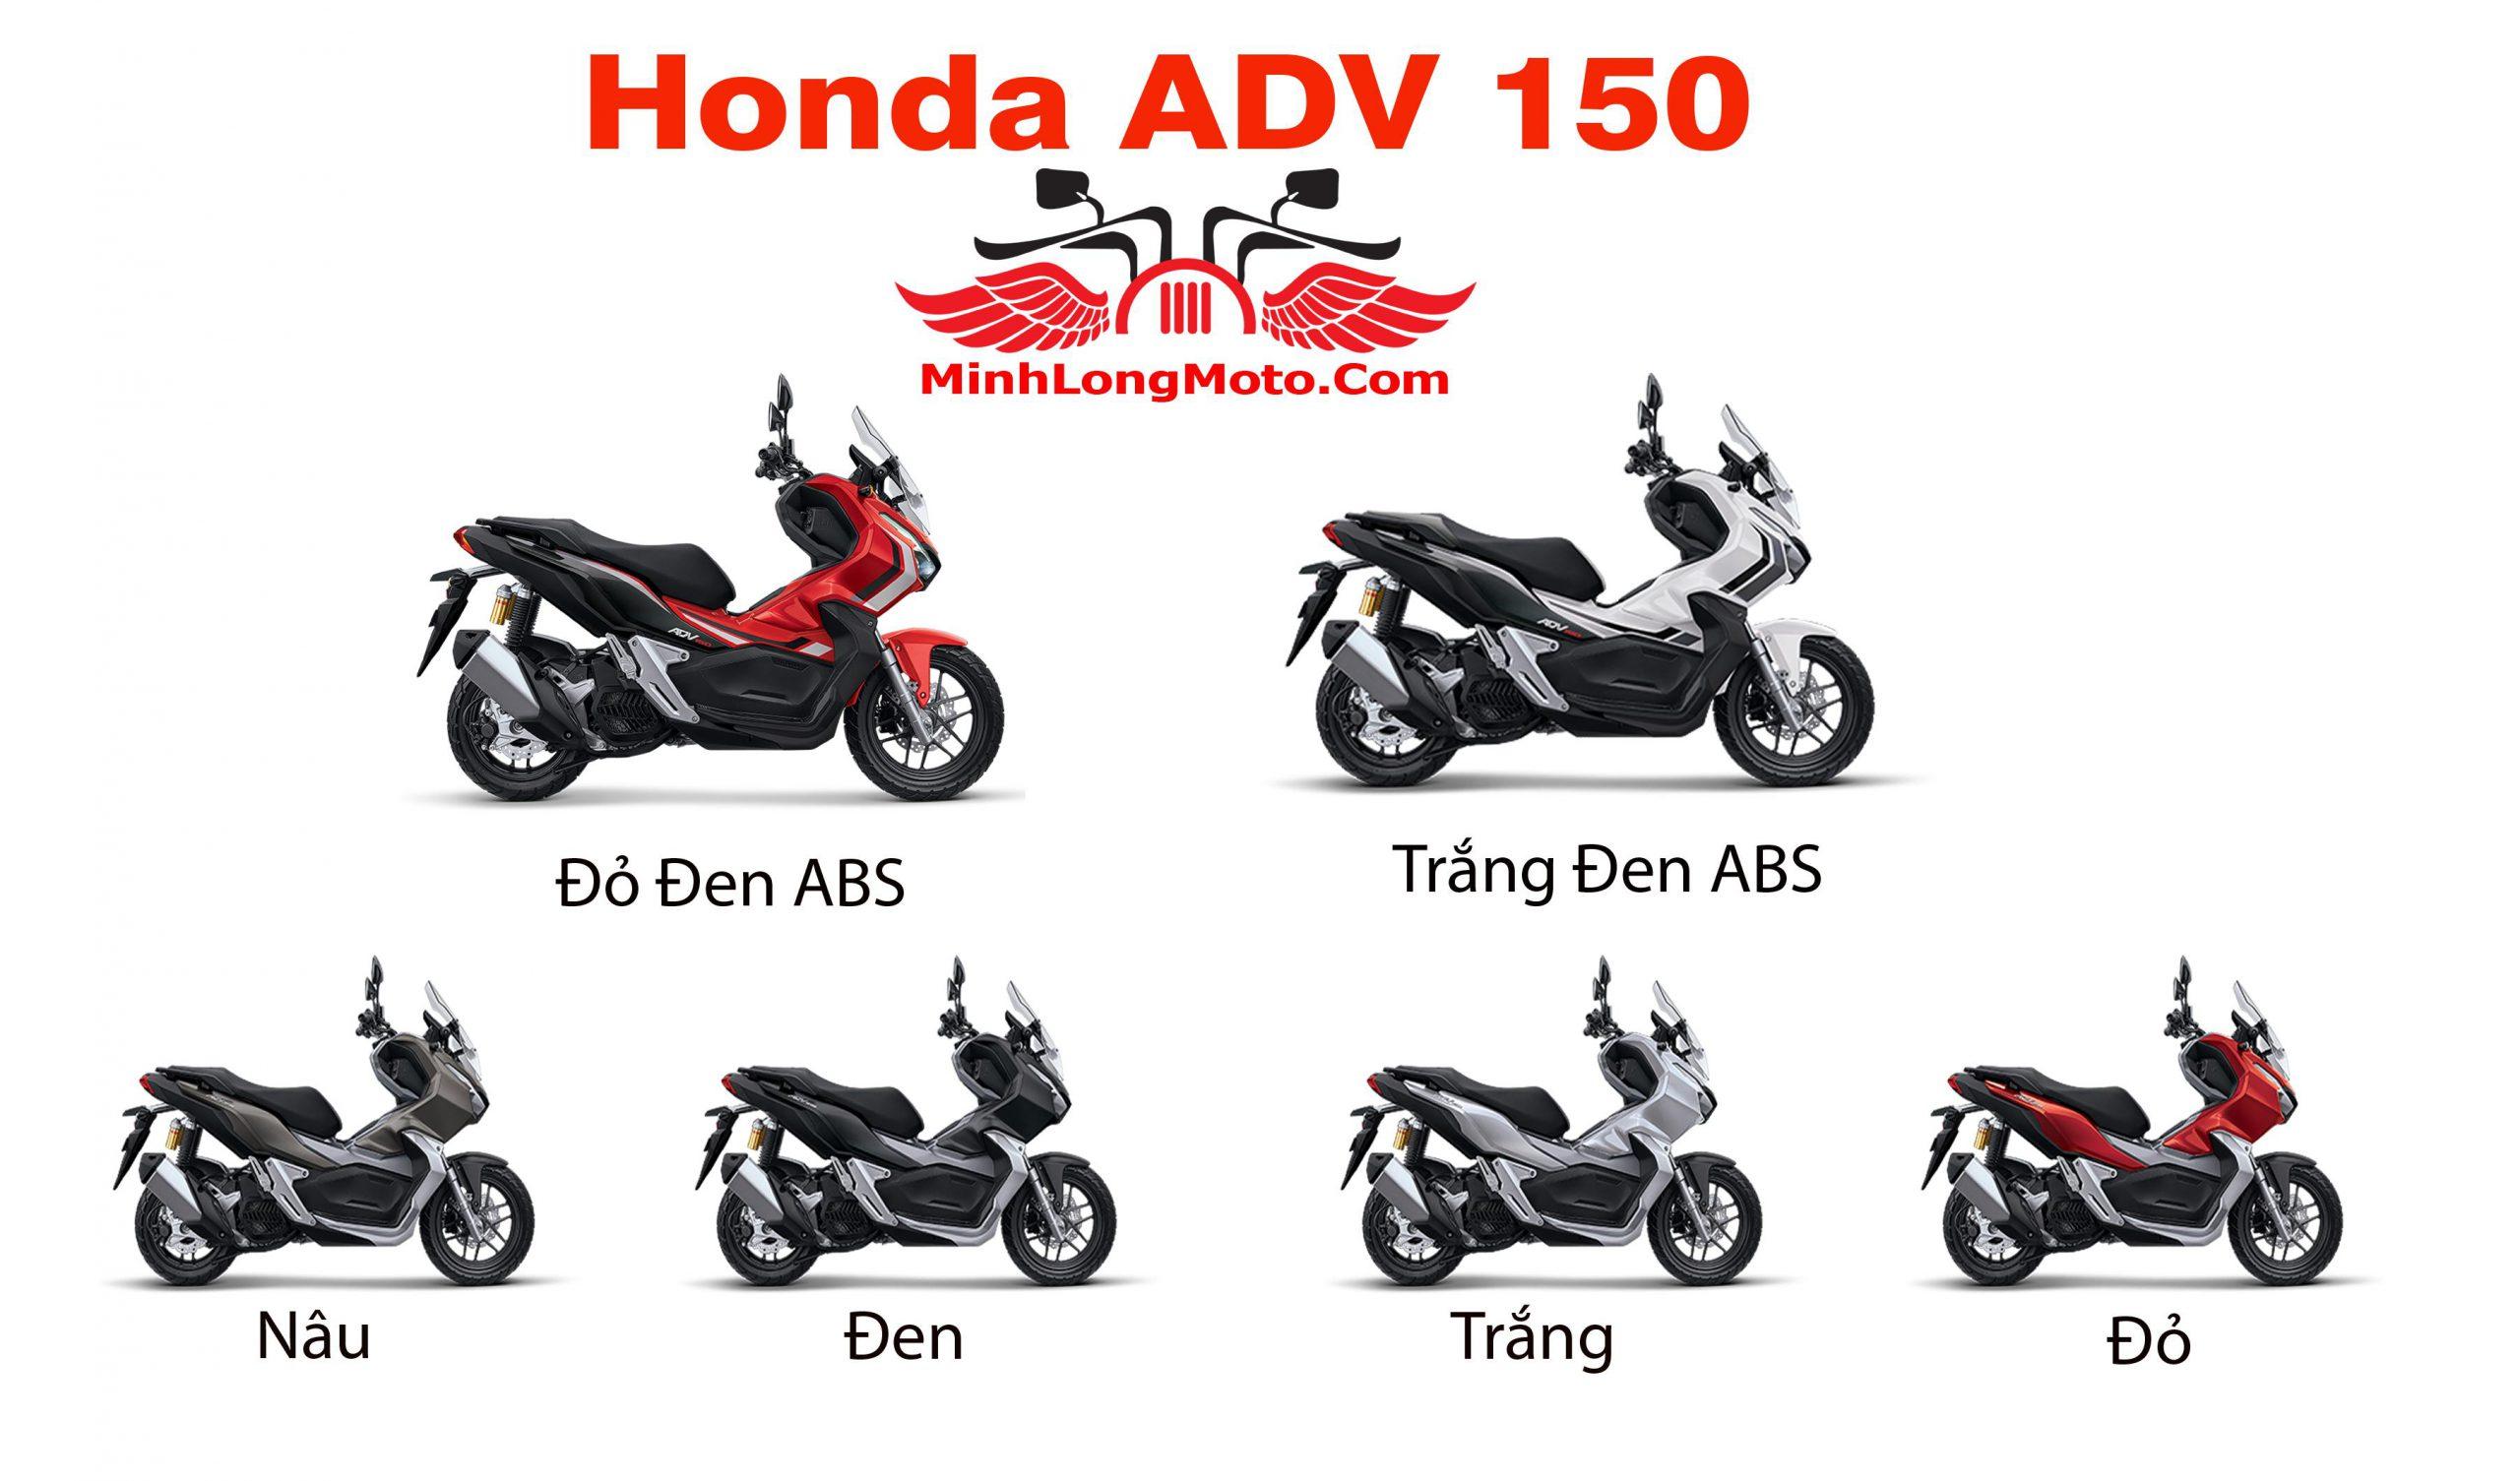 Phiên bản Honda ADV 150 ABS